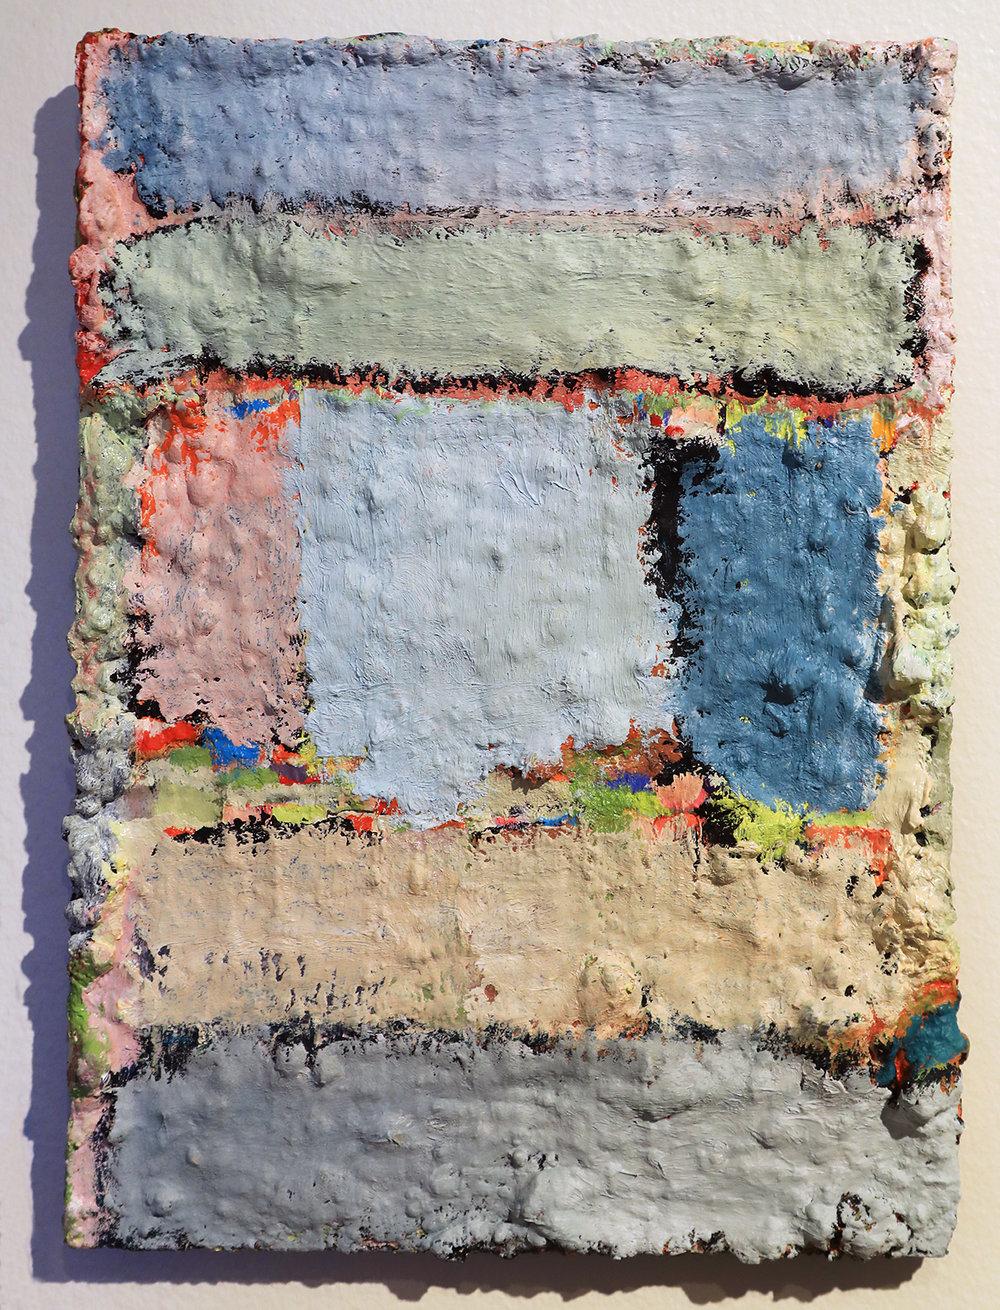 Douglas Degges.  Untitled.  2018. oil and gypsum on panel.